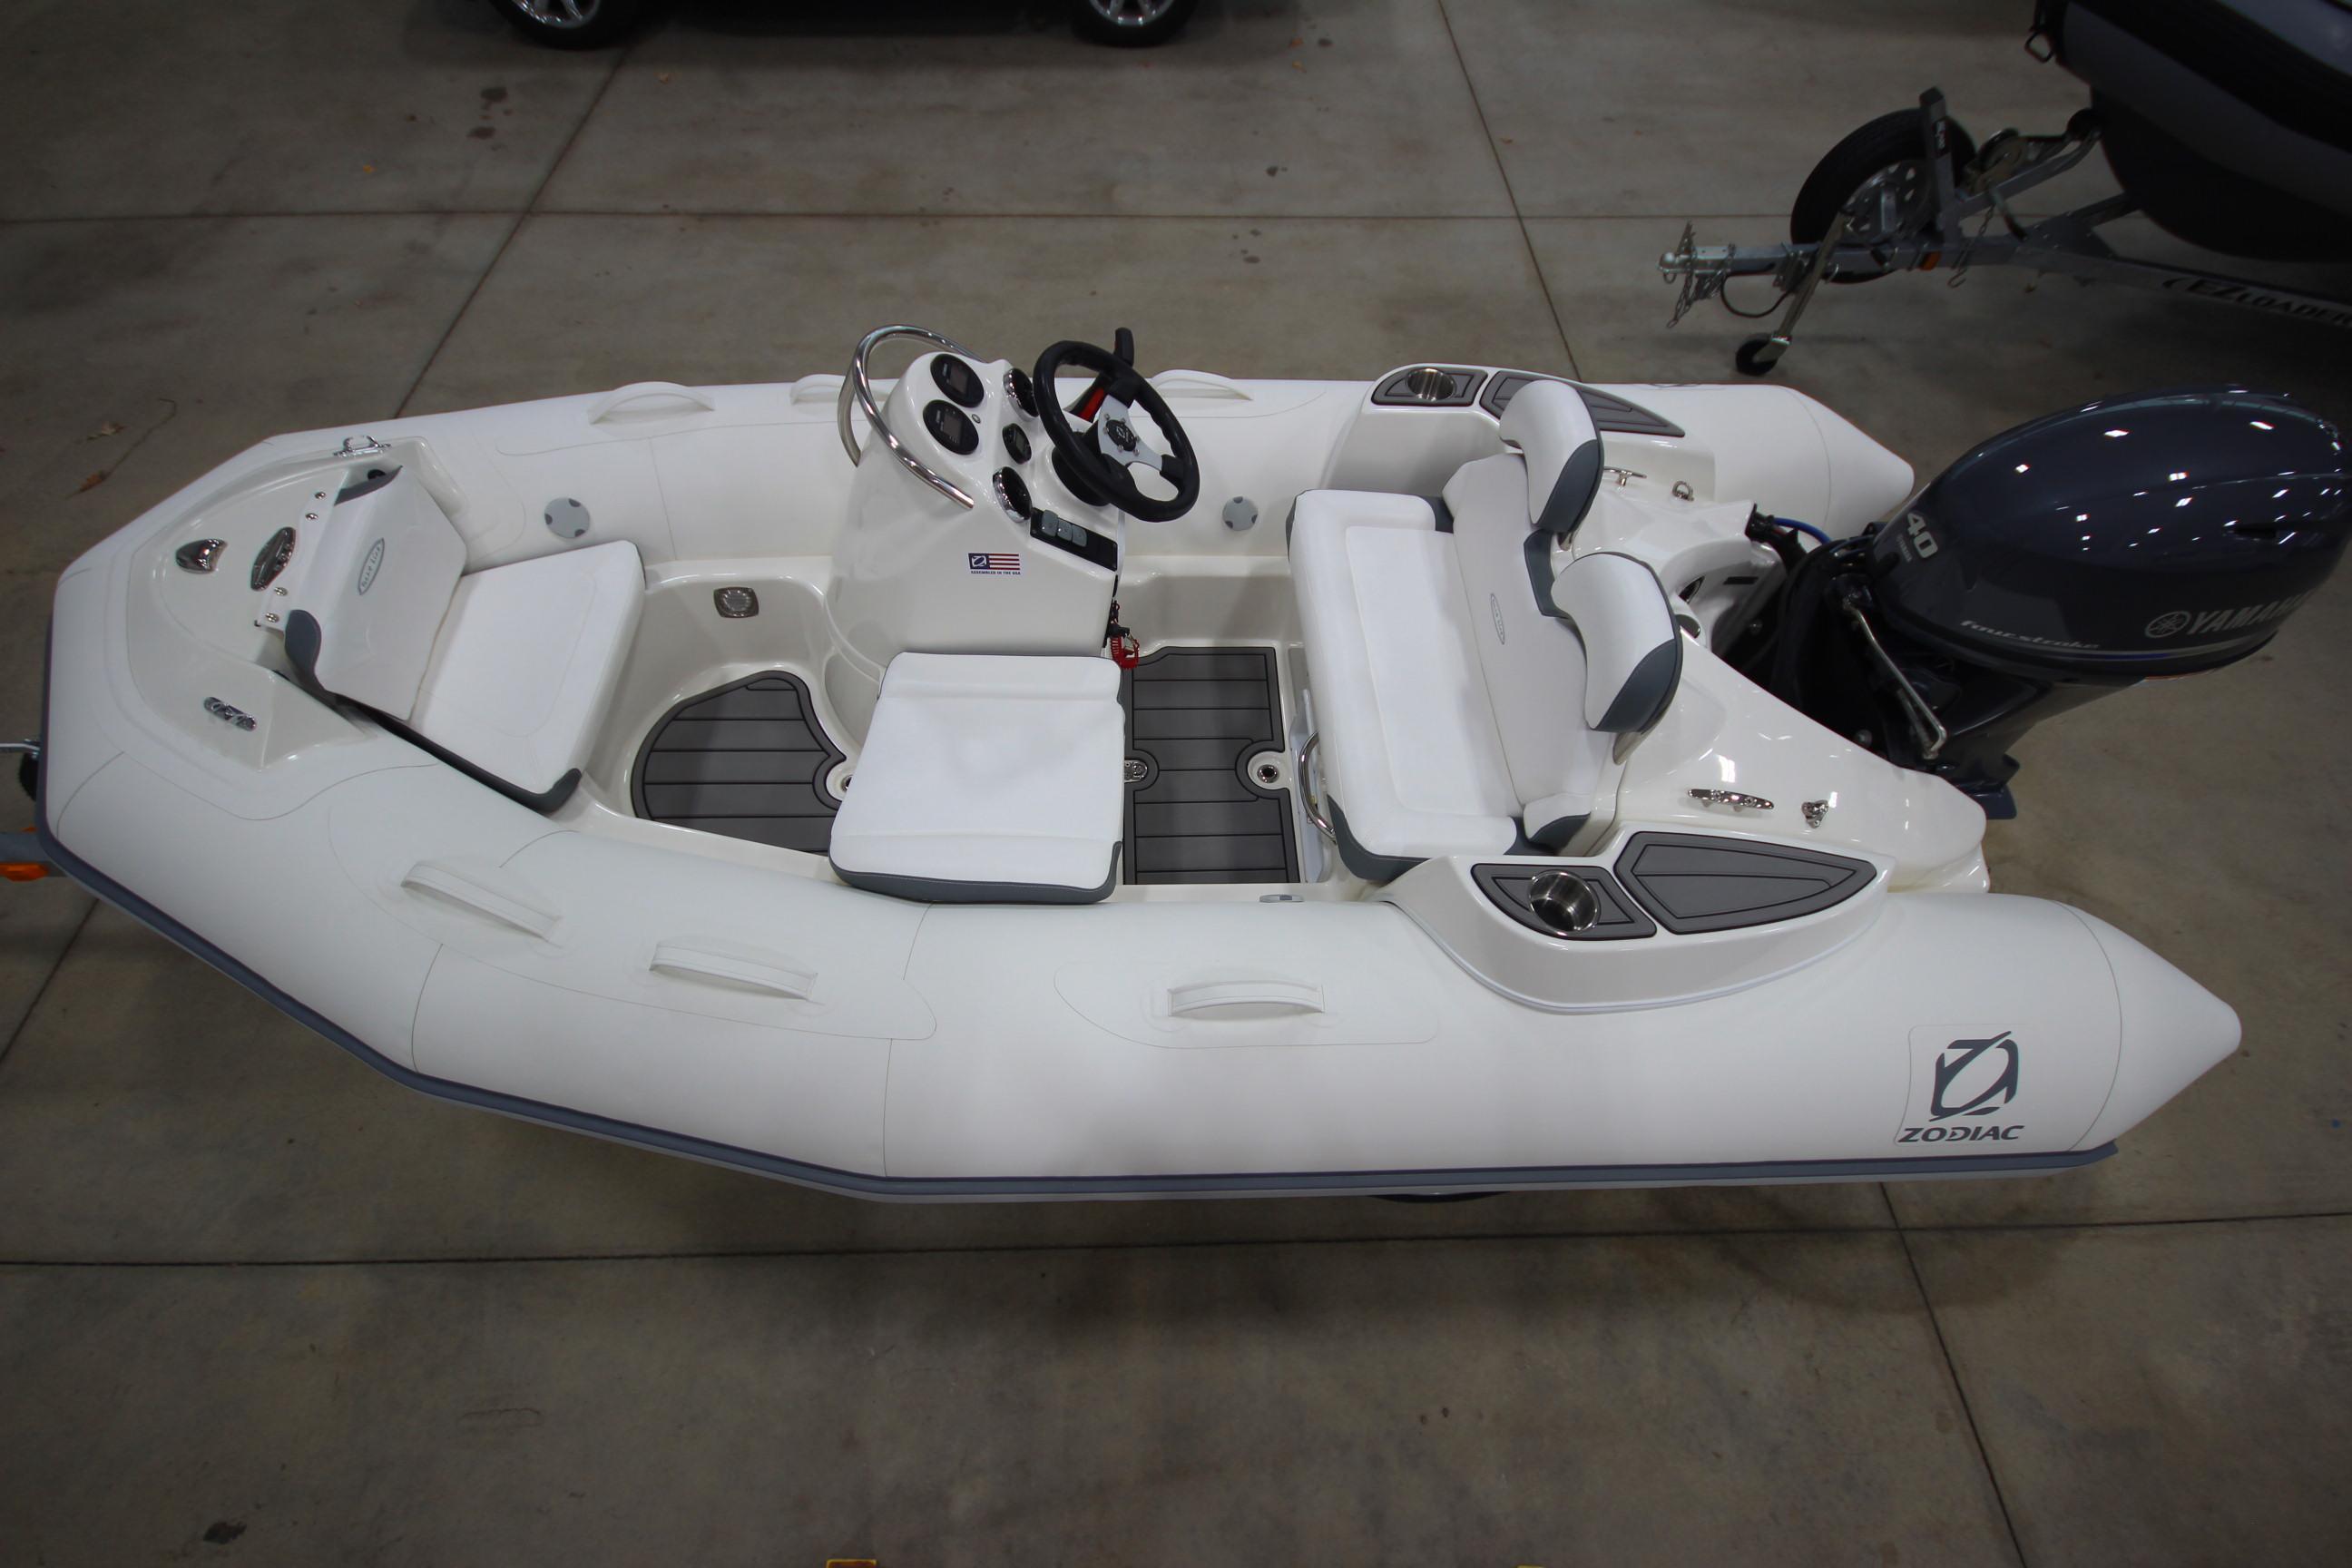 2021 Zodiac Yachtline 360 DL NEO GL Edition 40hp In Stock, Image 24